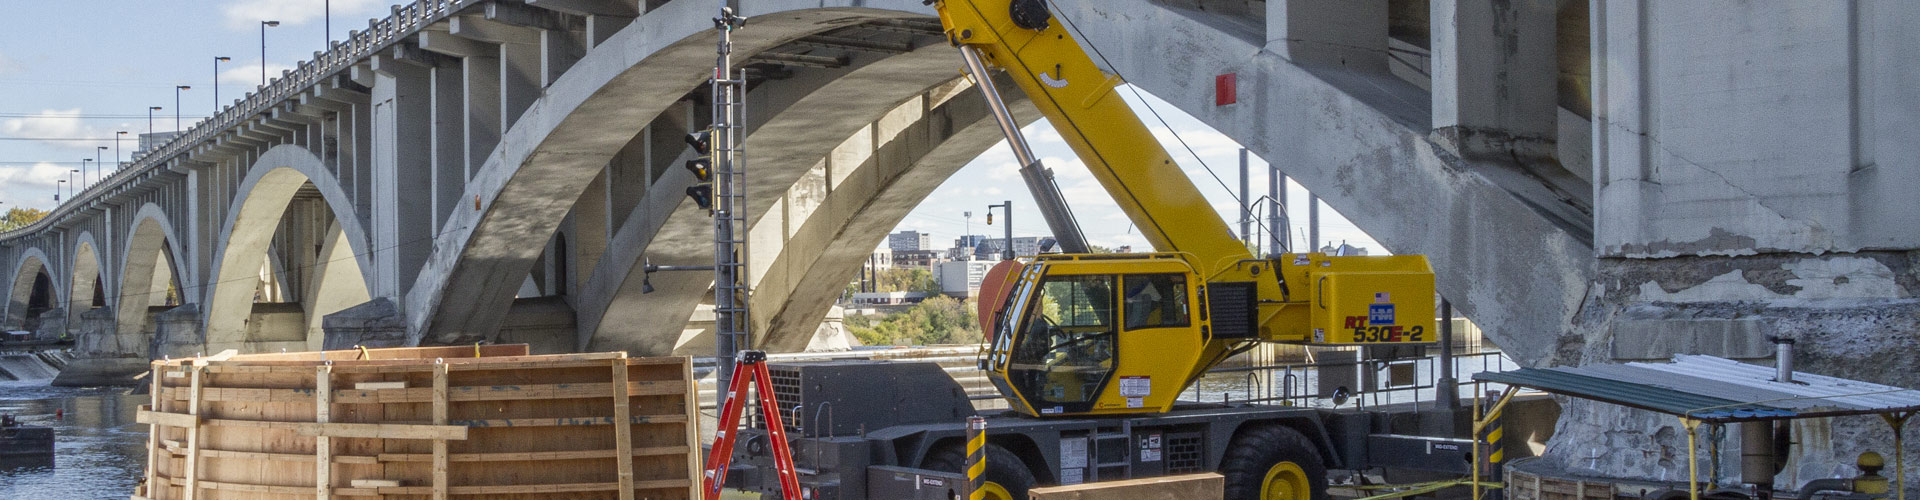 marine construction, bridge repair, bridge construction, concrete placement, underwater construction, pier repairs